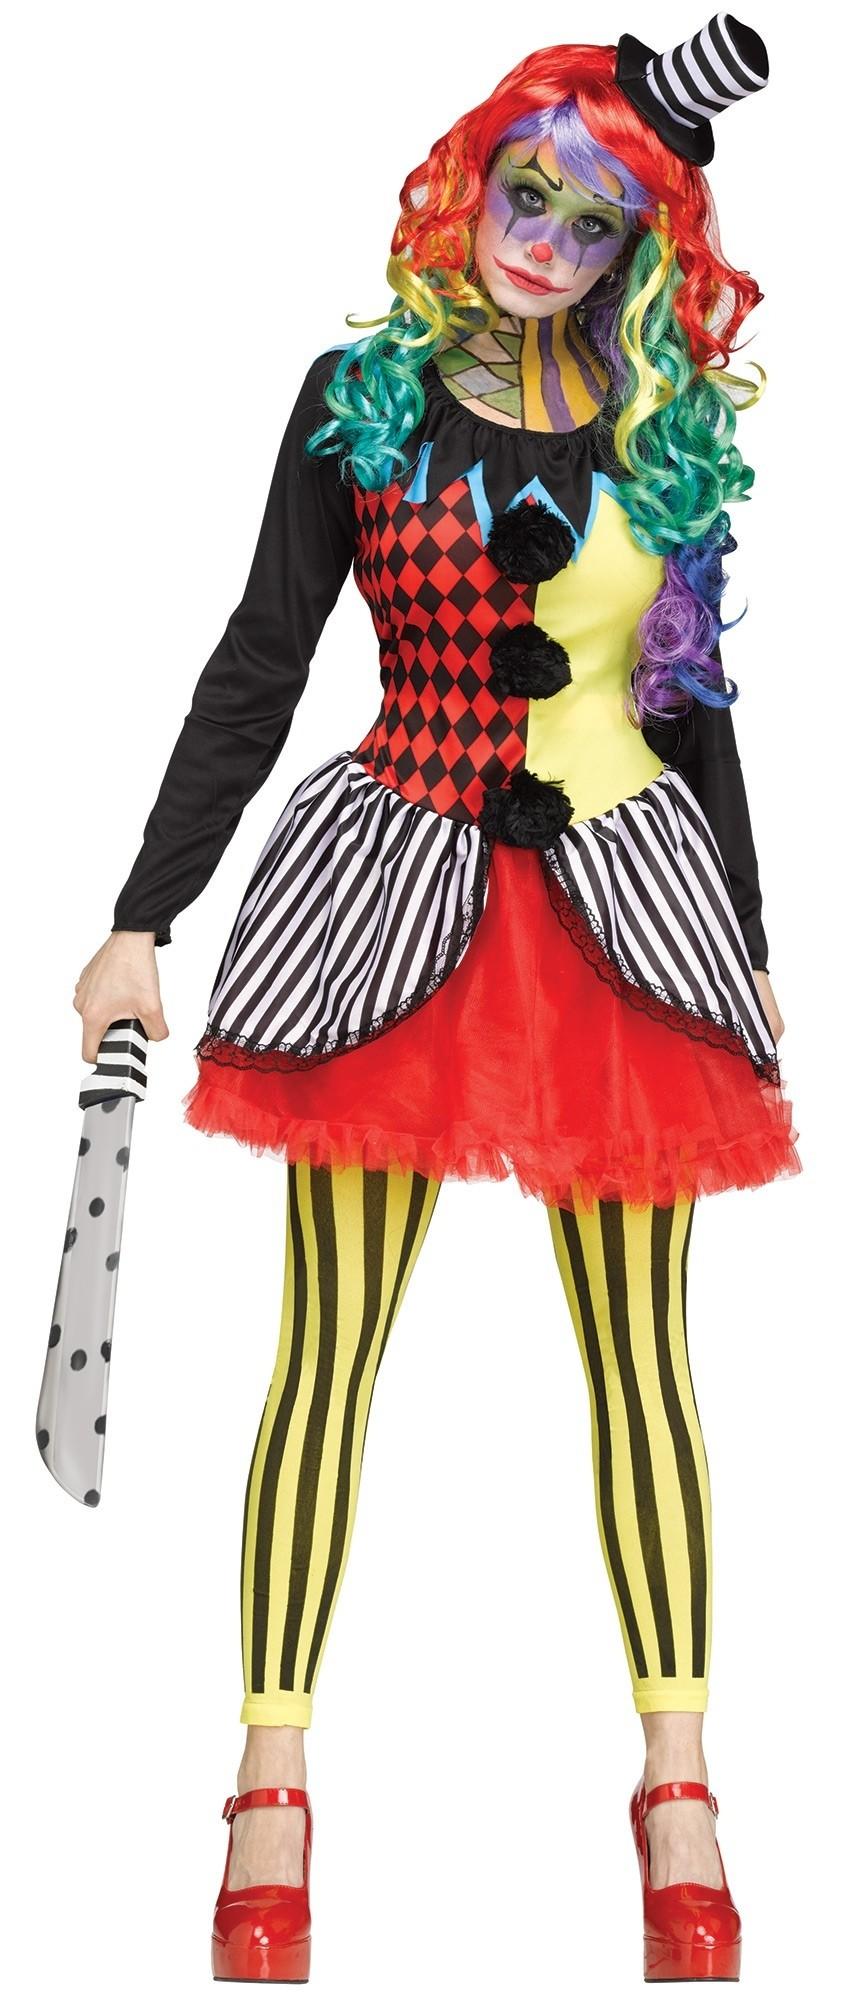 Женский костюм клоунессы-фрика (44) костюм клоунессы взрослый электросталь